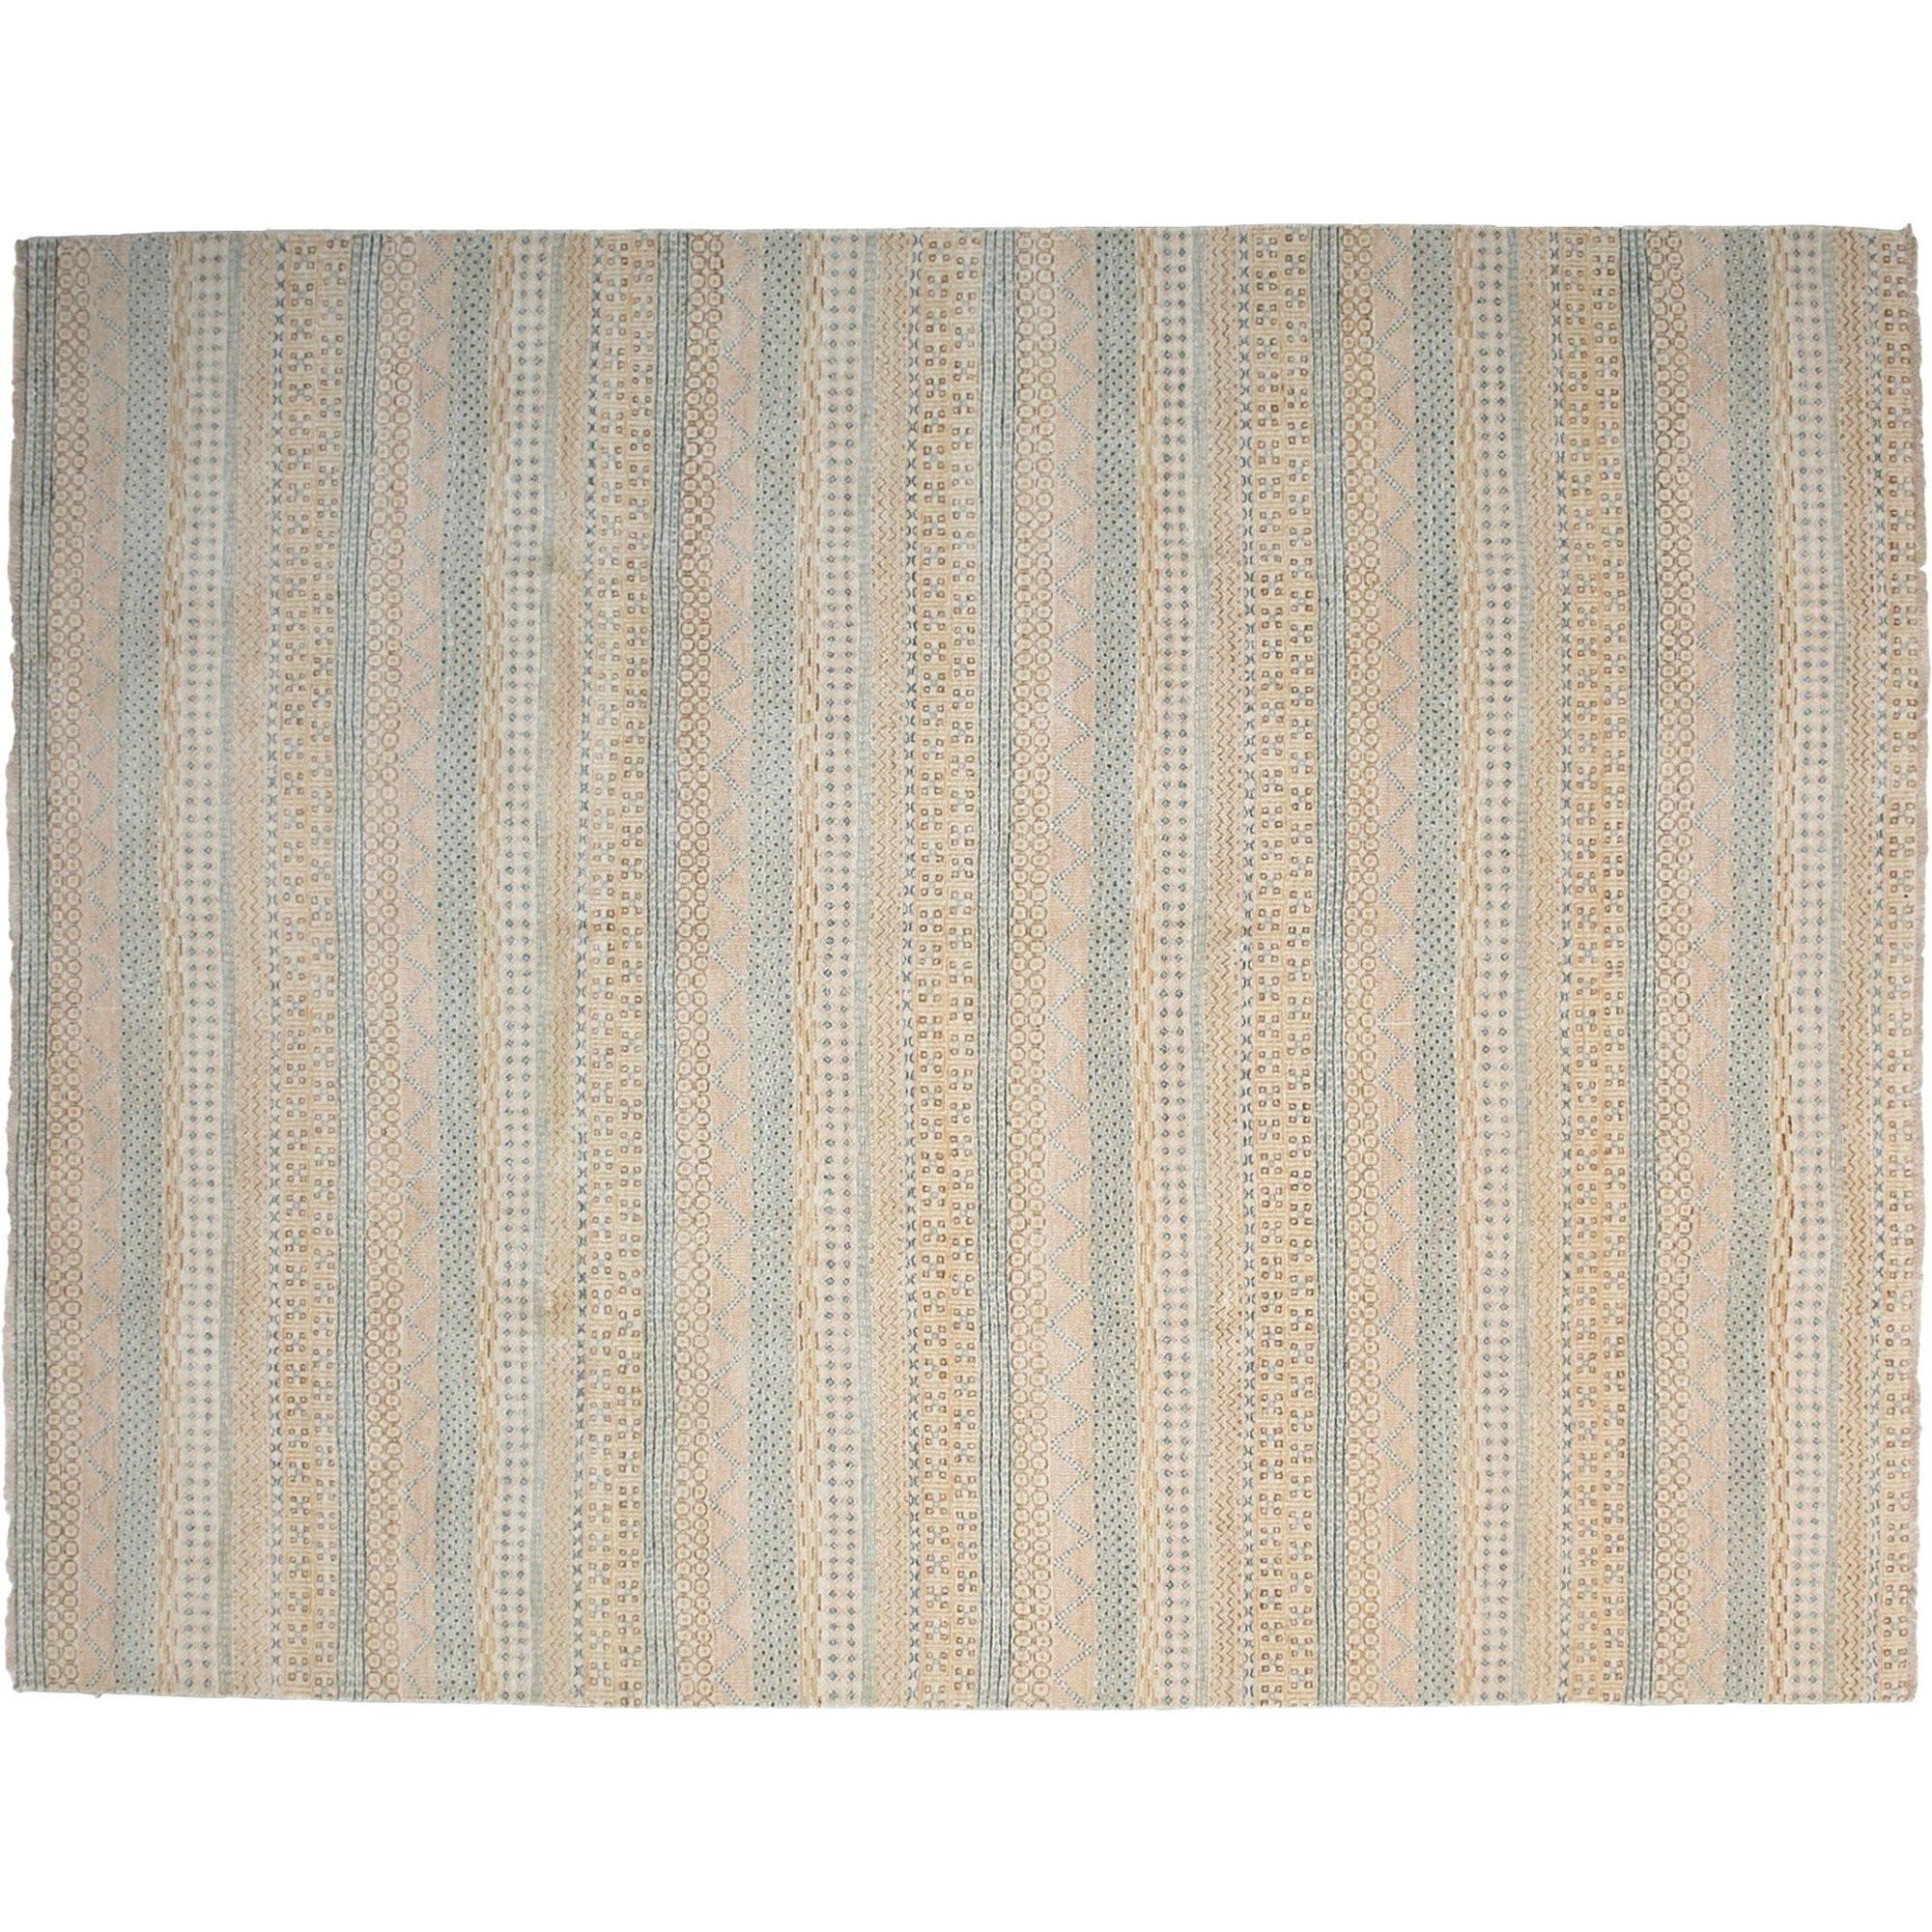 classic beige wool area rug 8 0